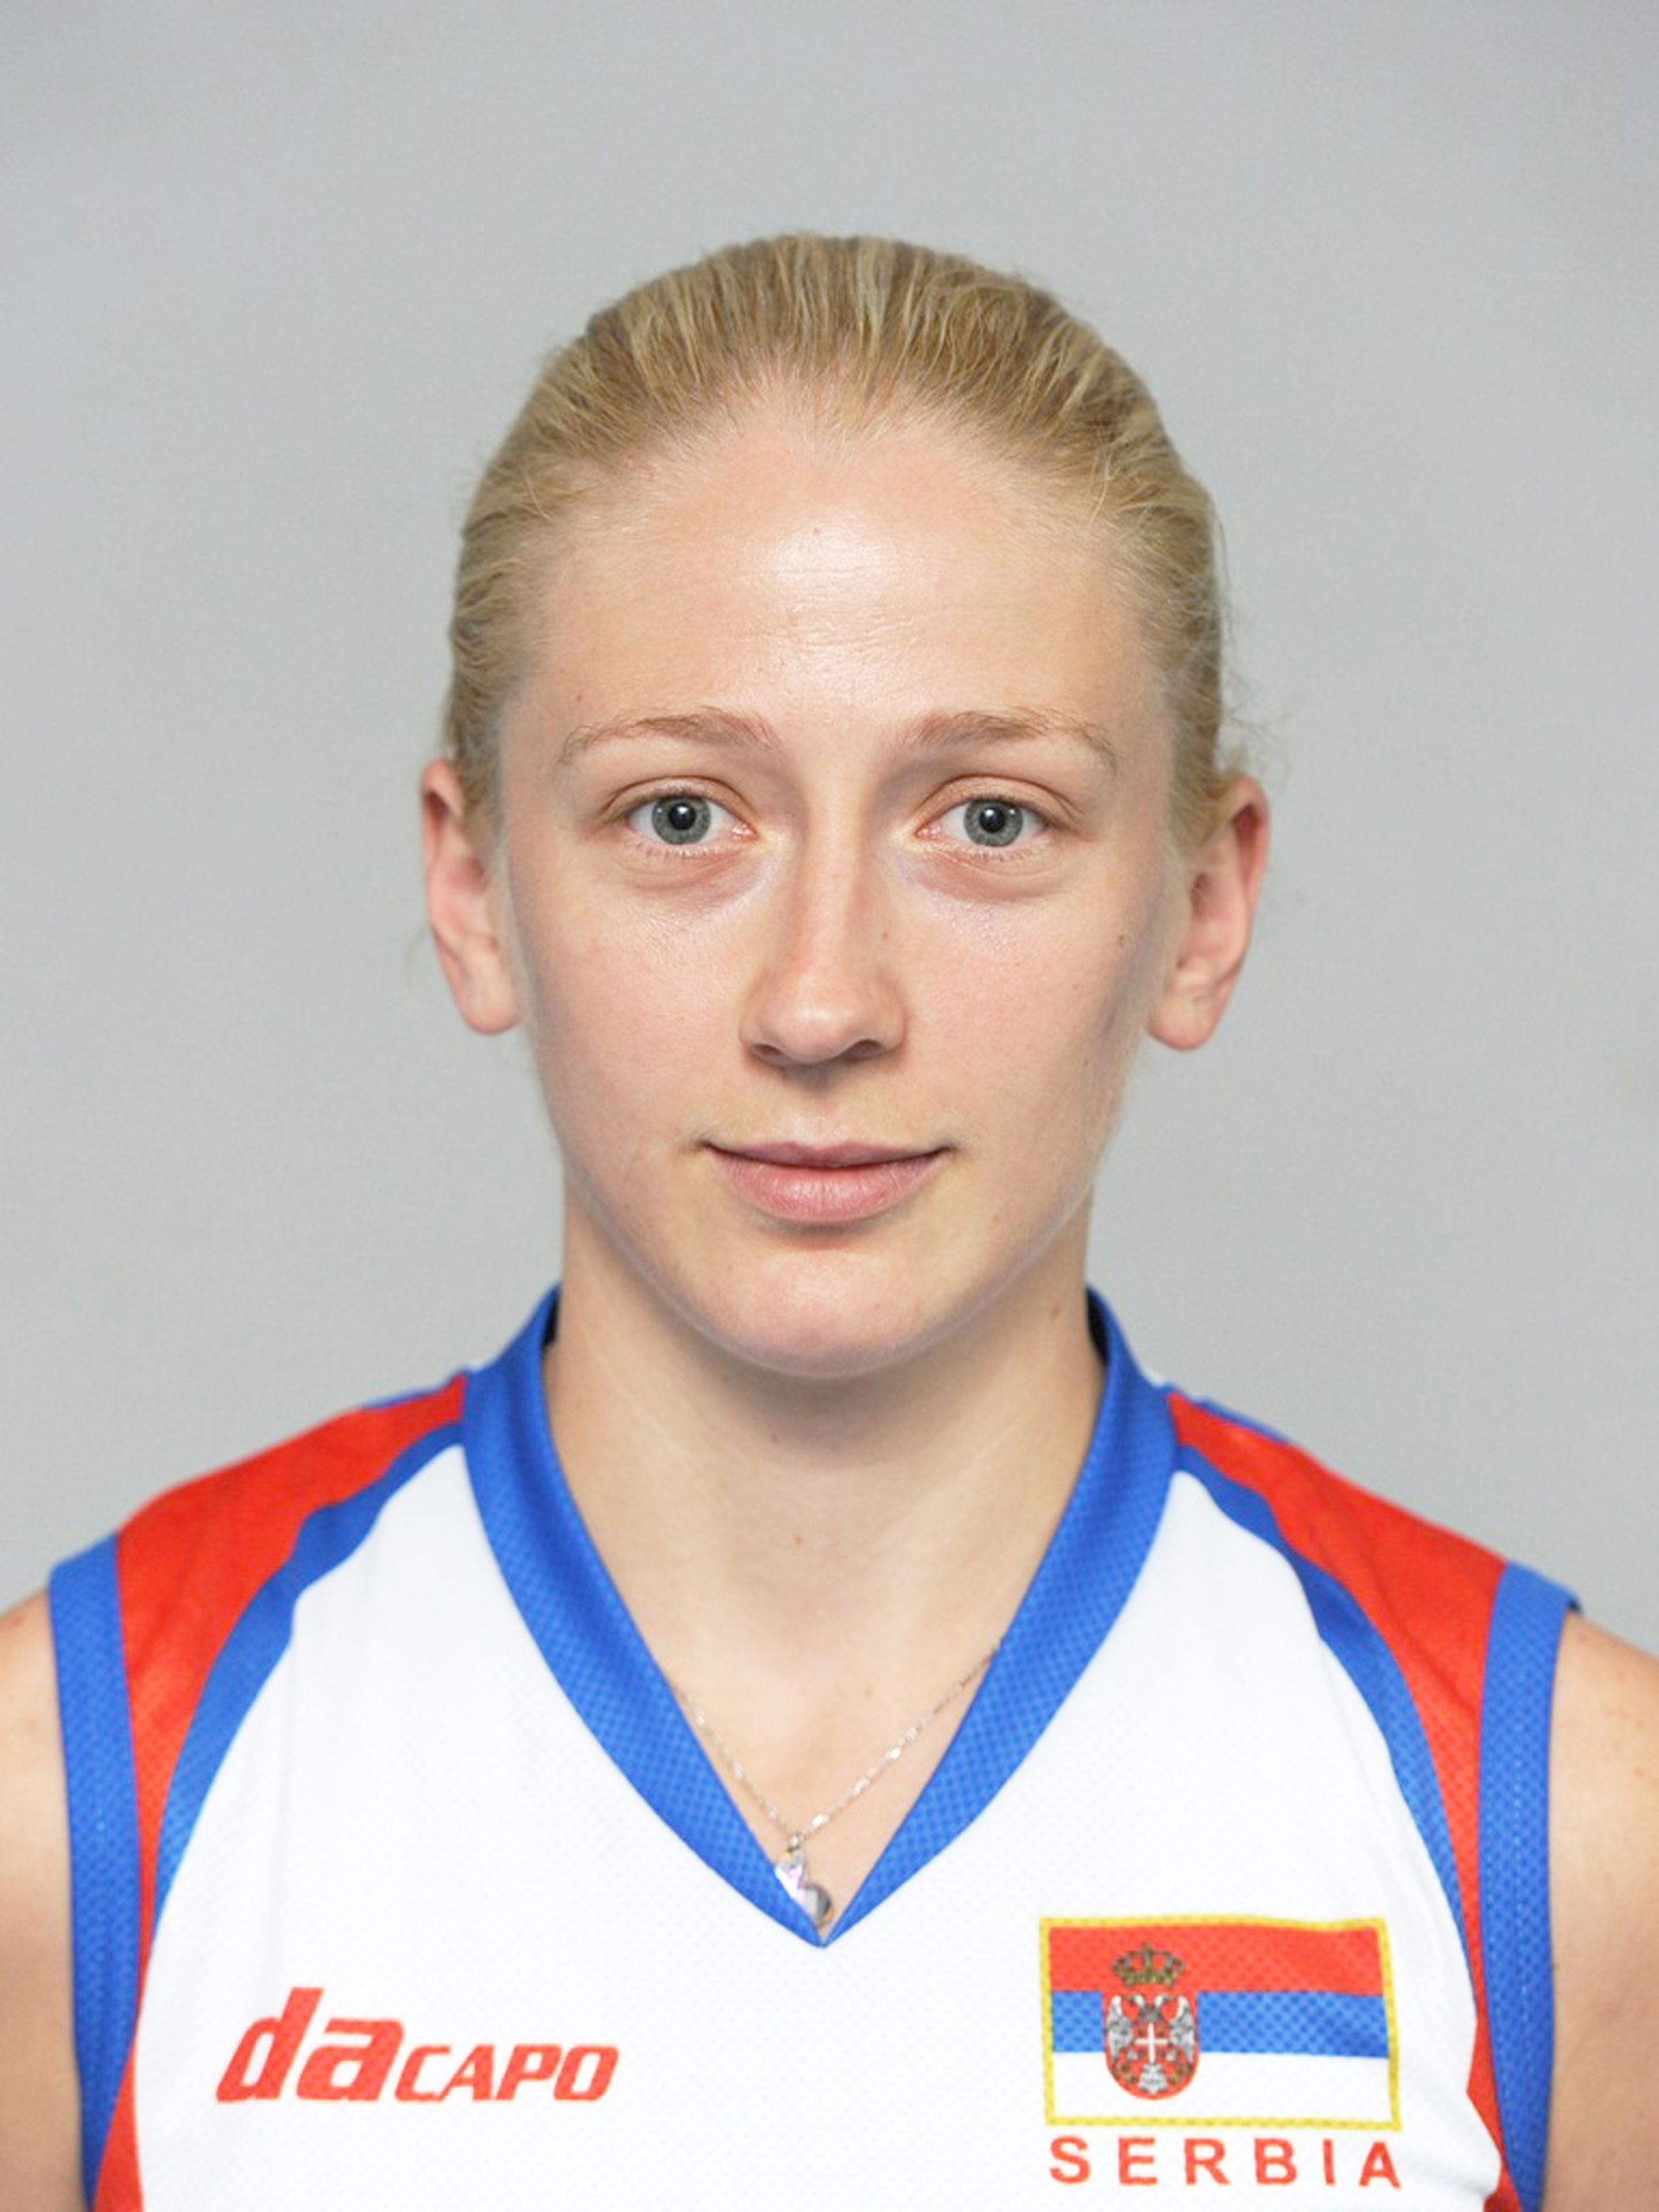 Suzana Cebic